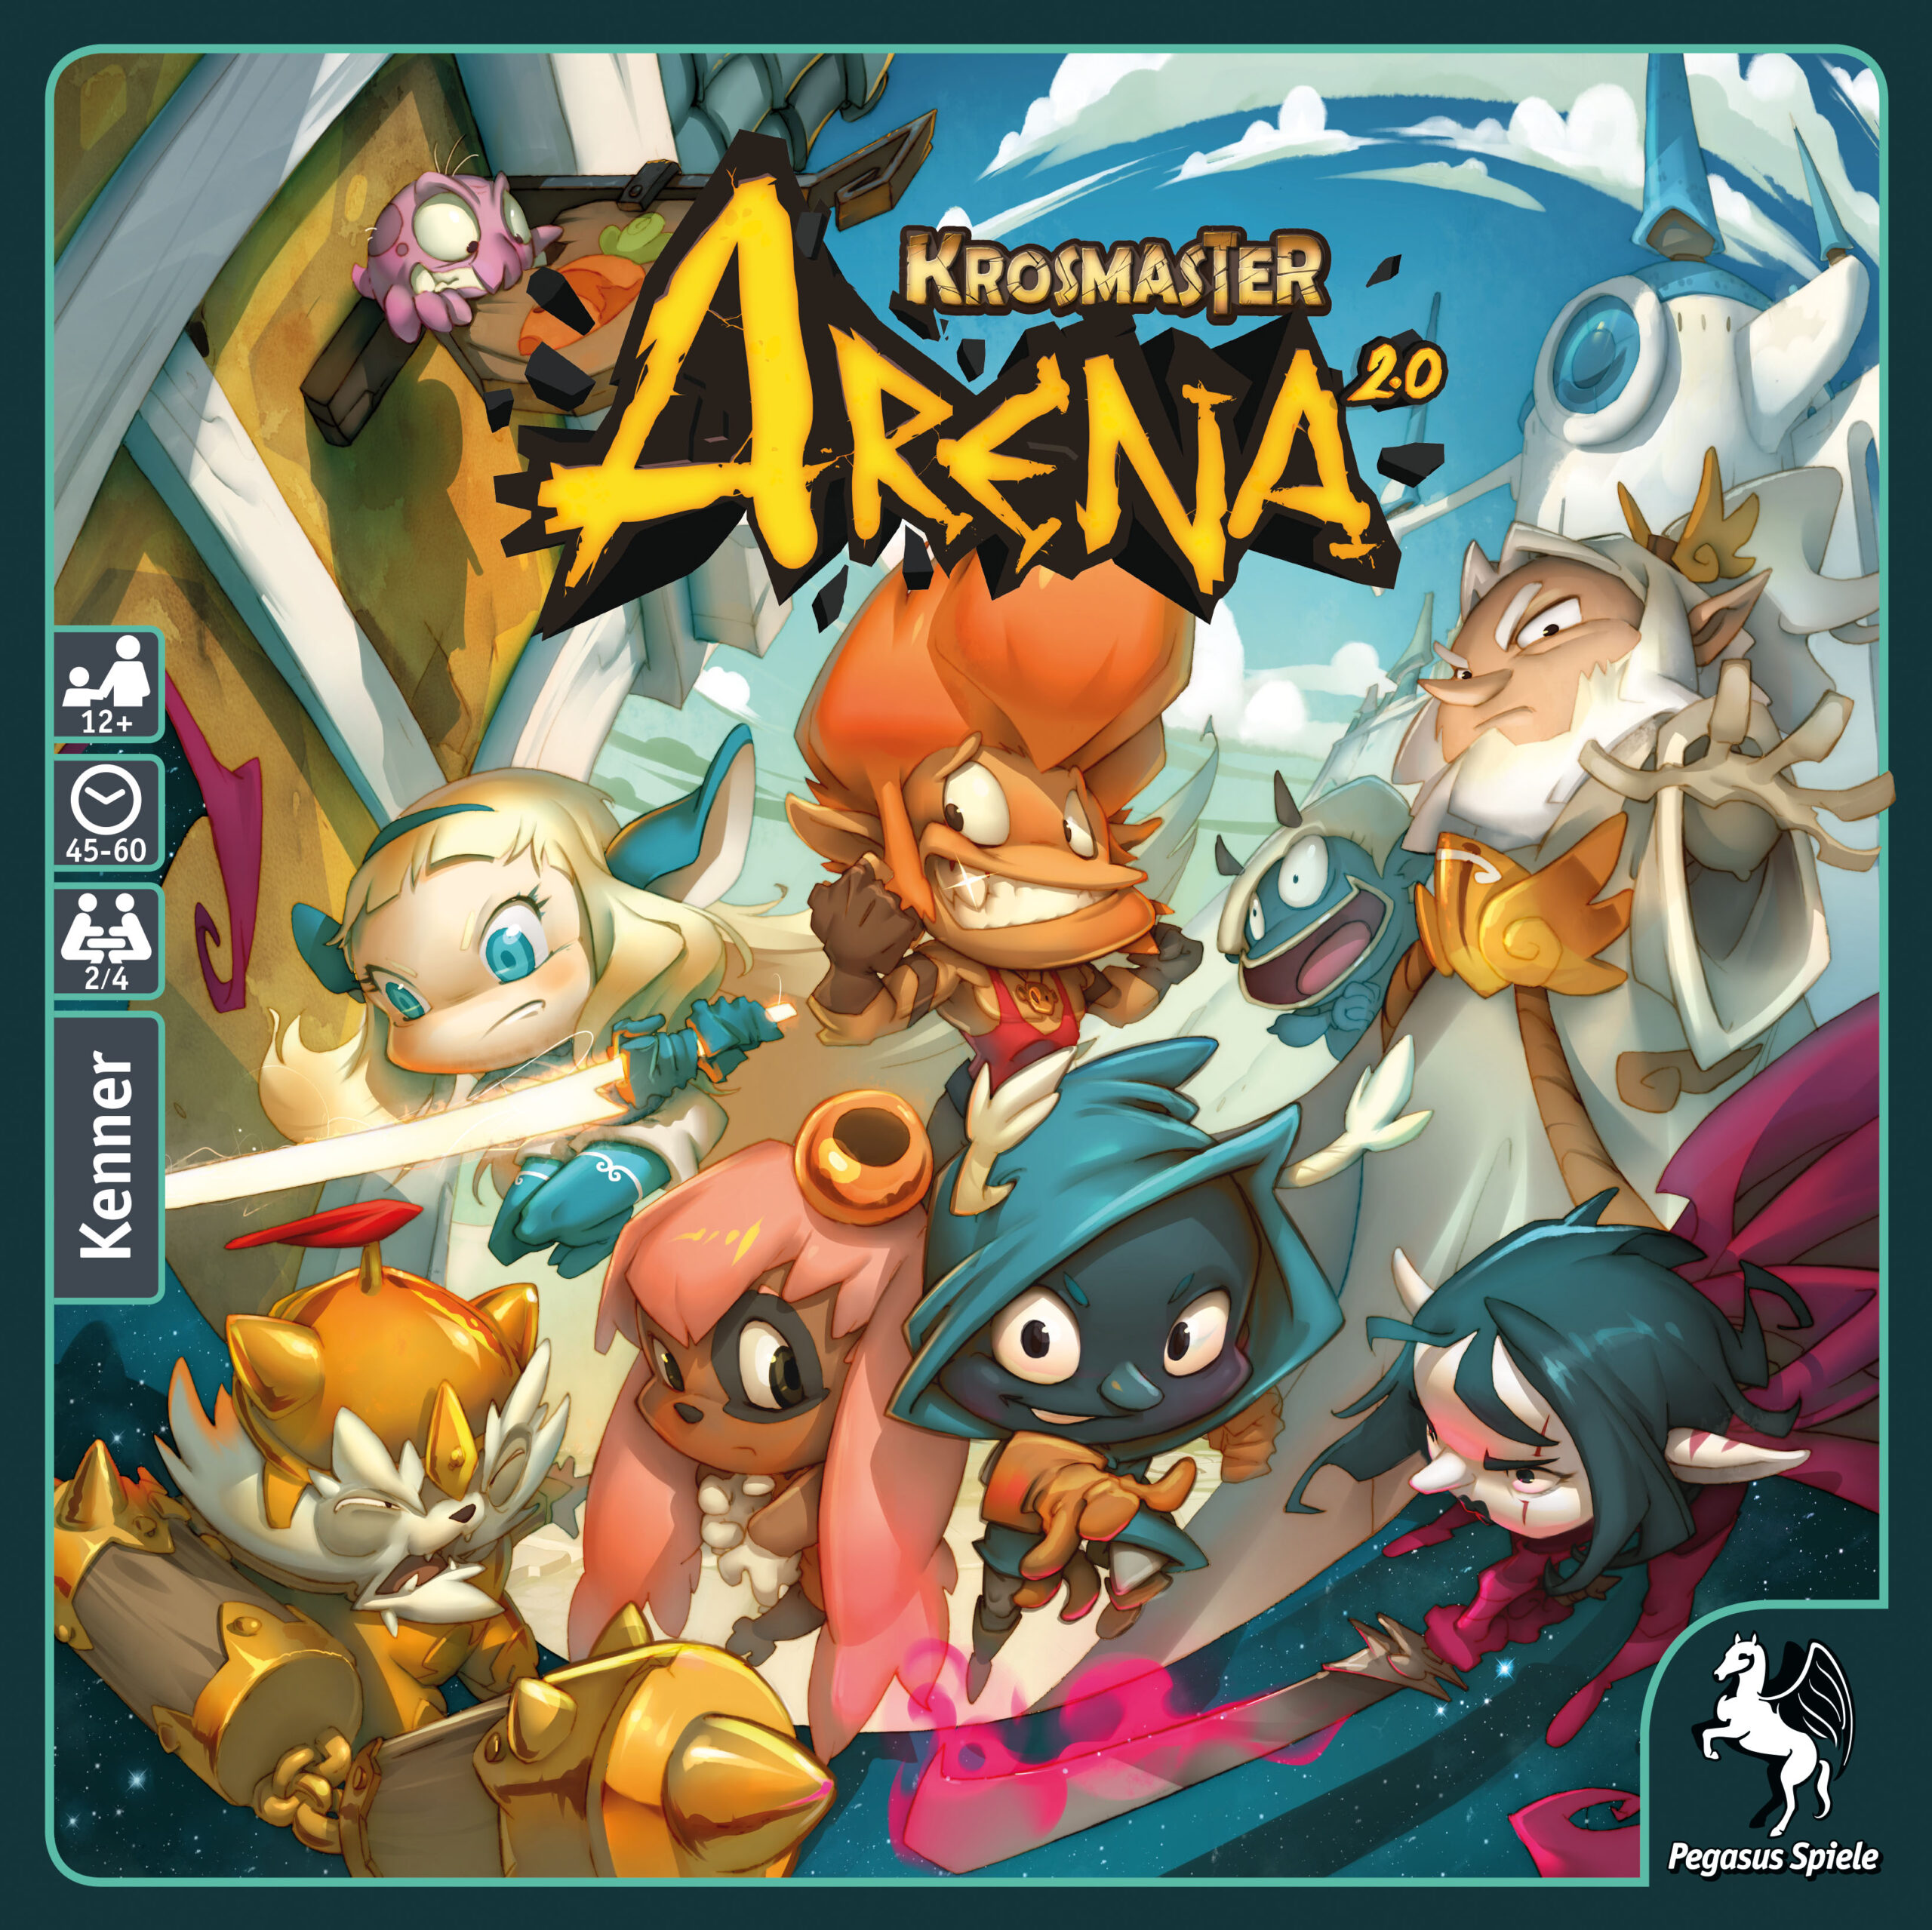 Krosmaster Arena: Demorunden Krosmaster Arena